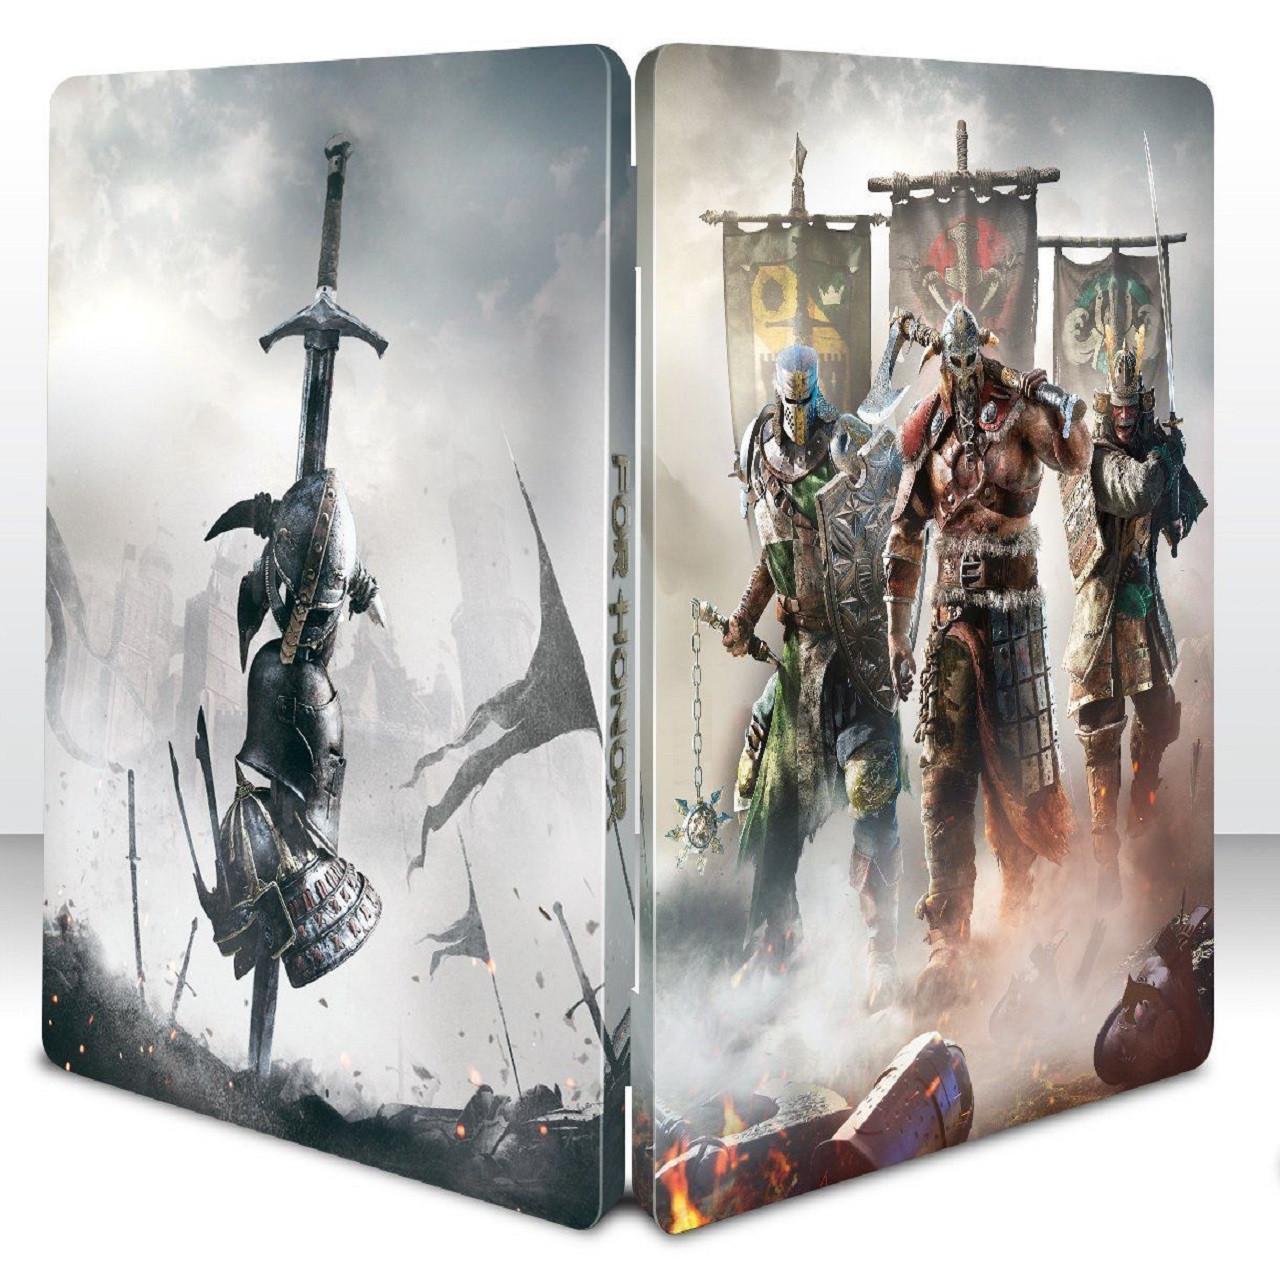 Steelbook For Honor PS4/XBOX (БЕЗ ГРИ)